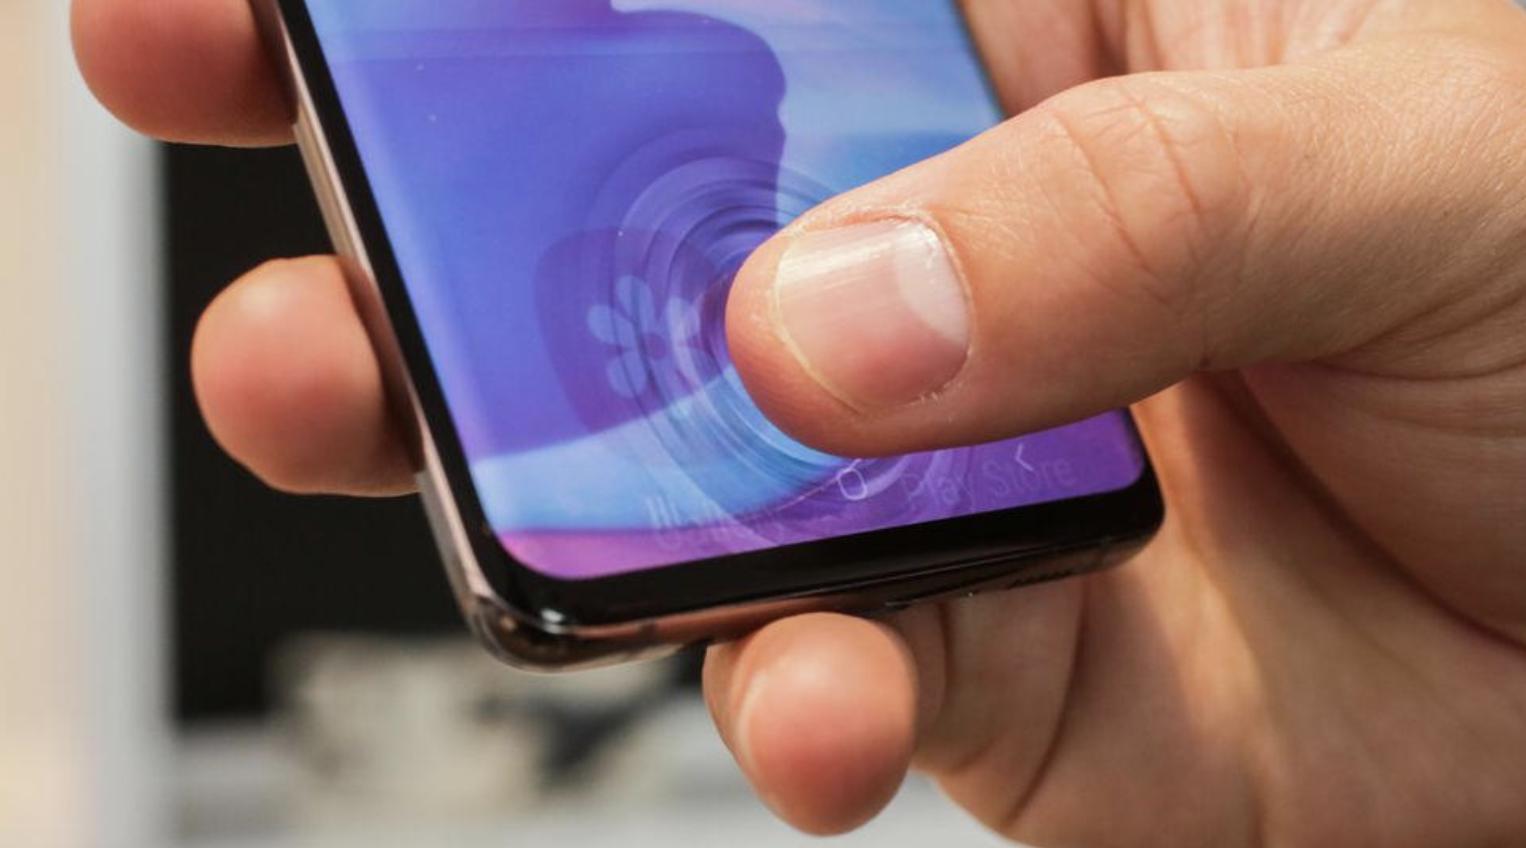 Galaxy S10 Fingerprint sensor